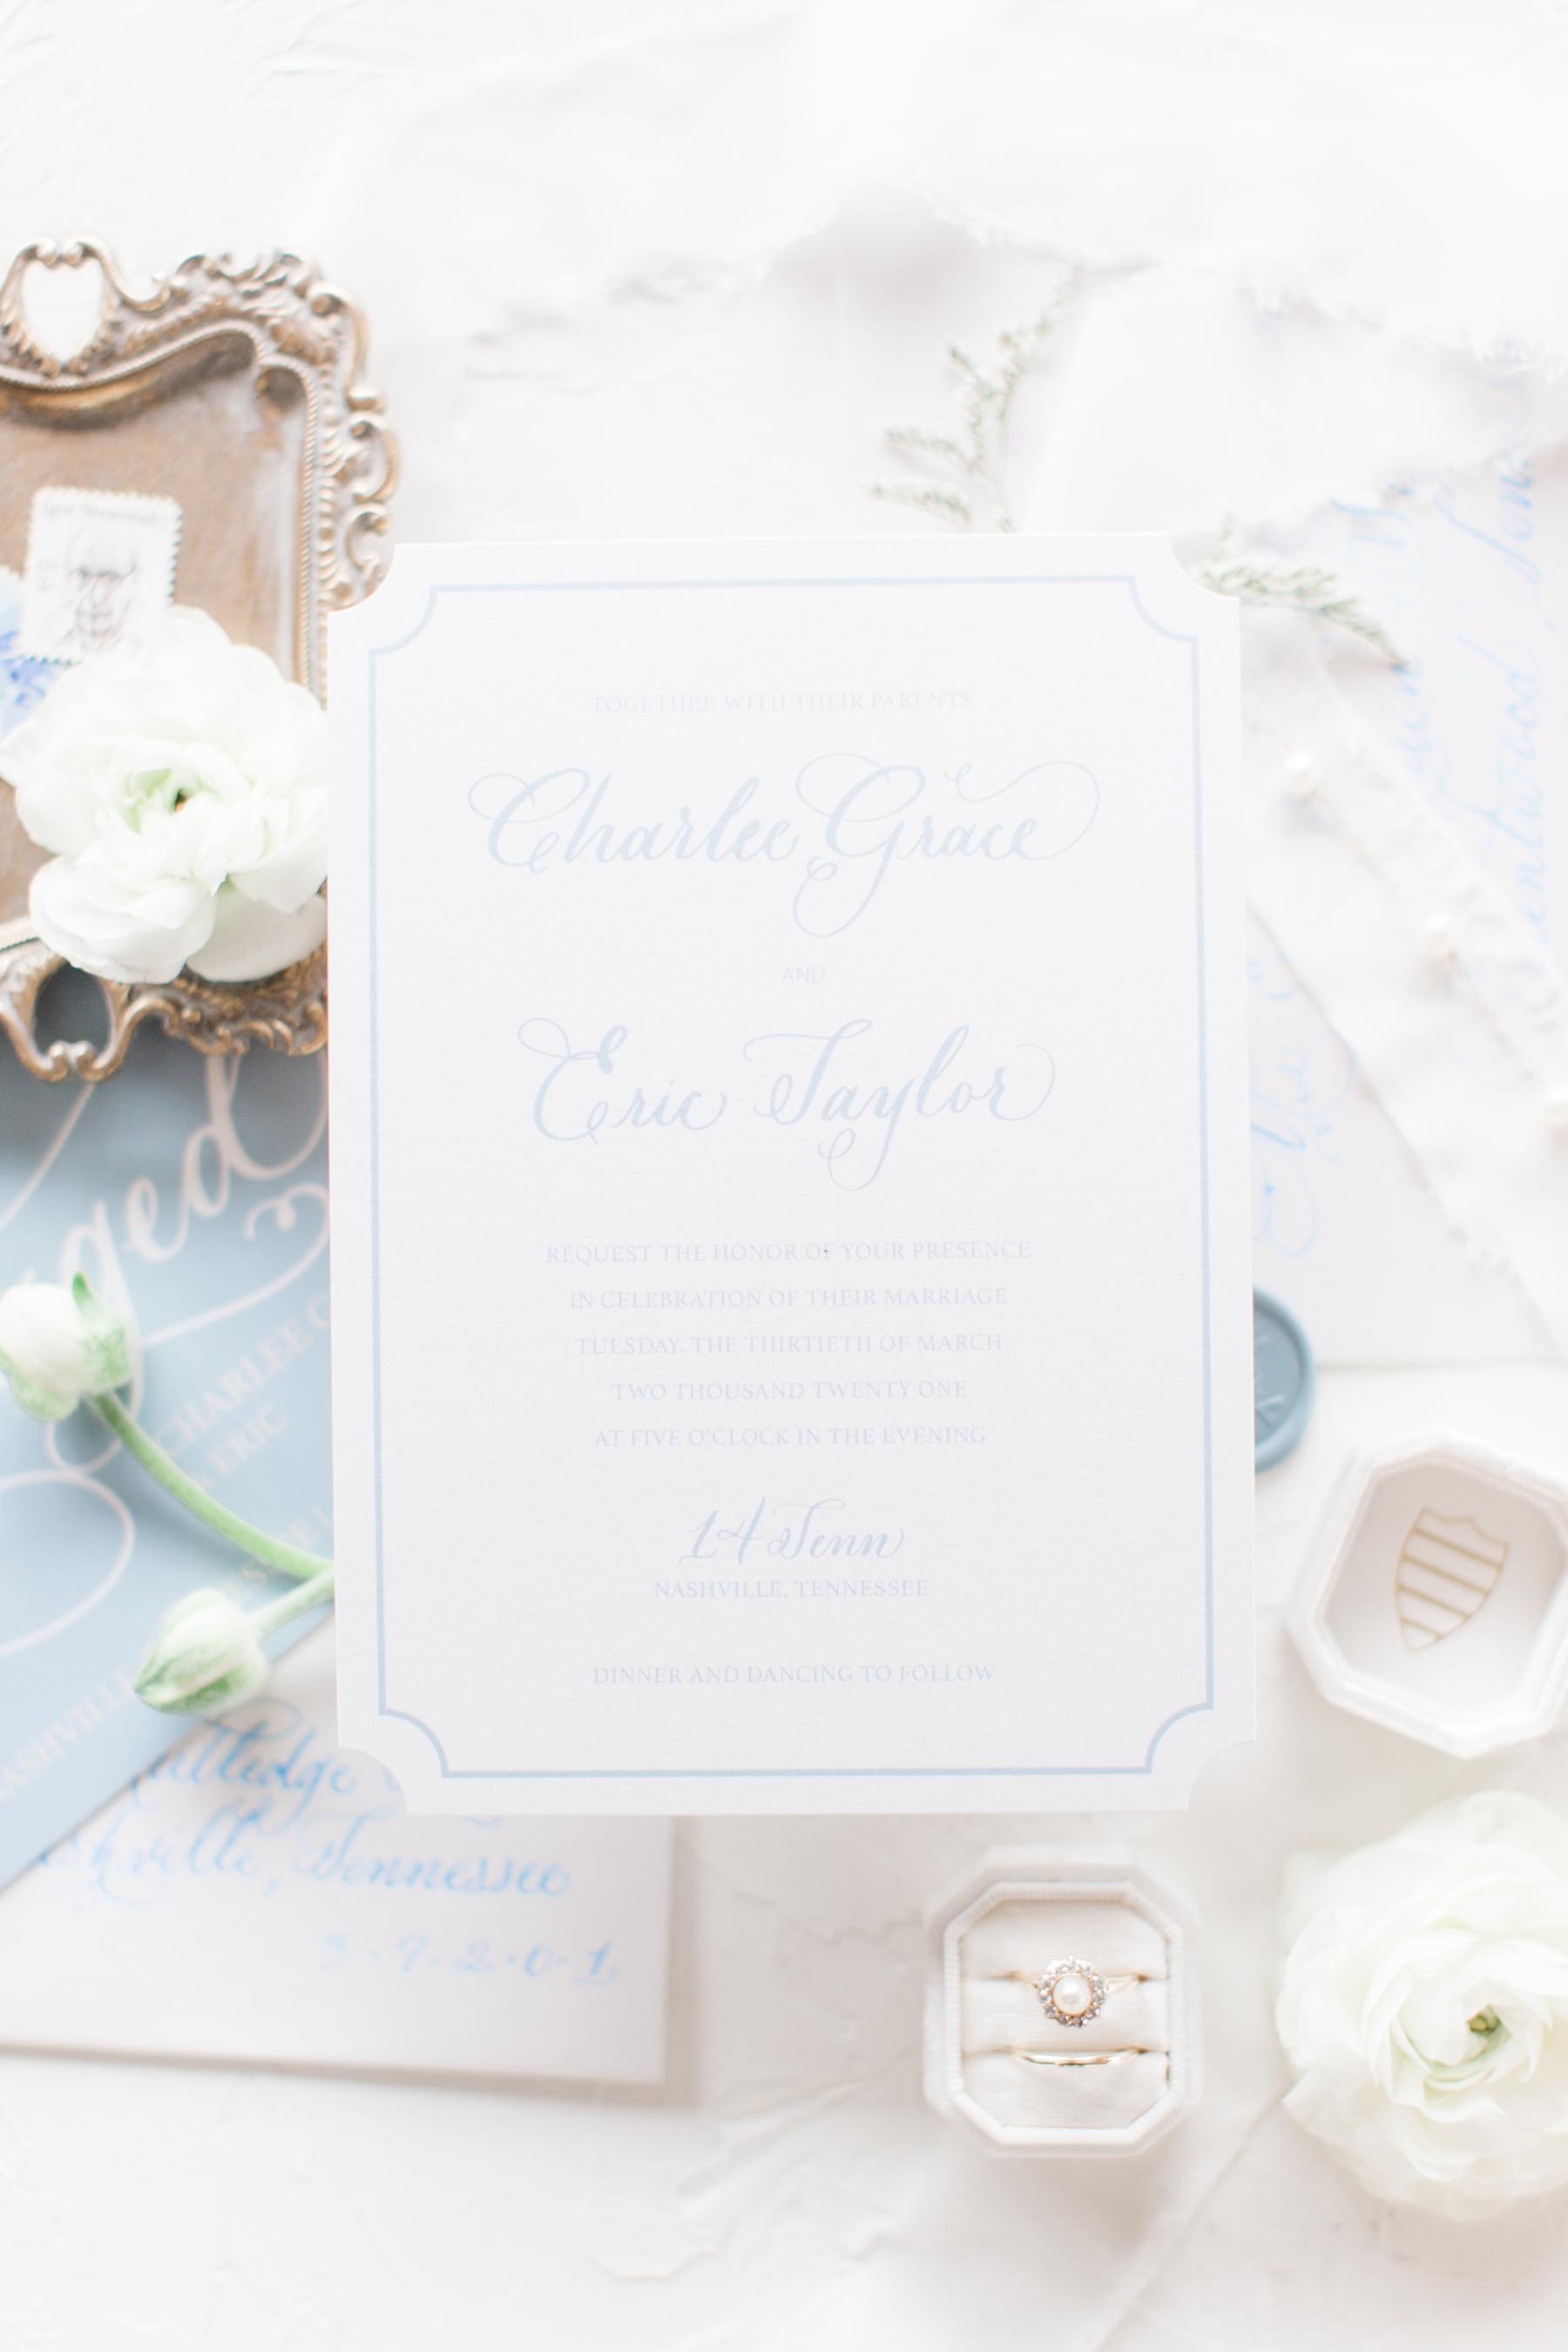 White Ink Calligraphy wedding stationery